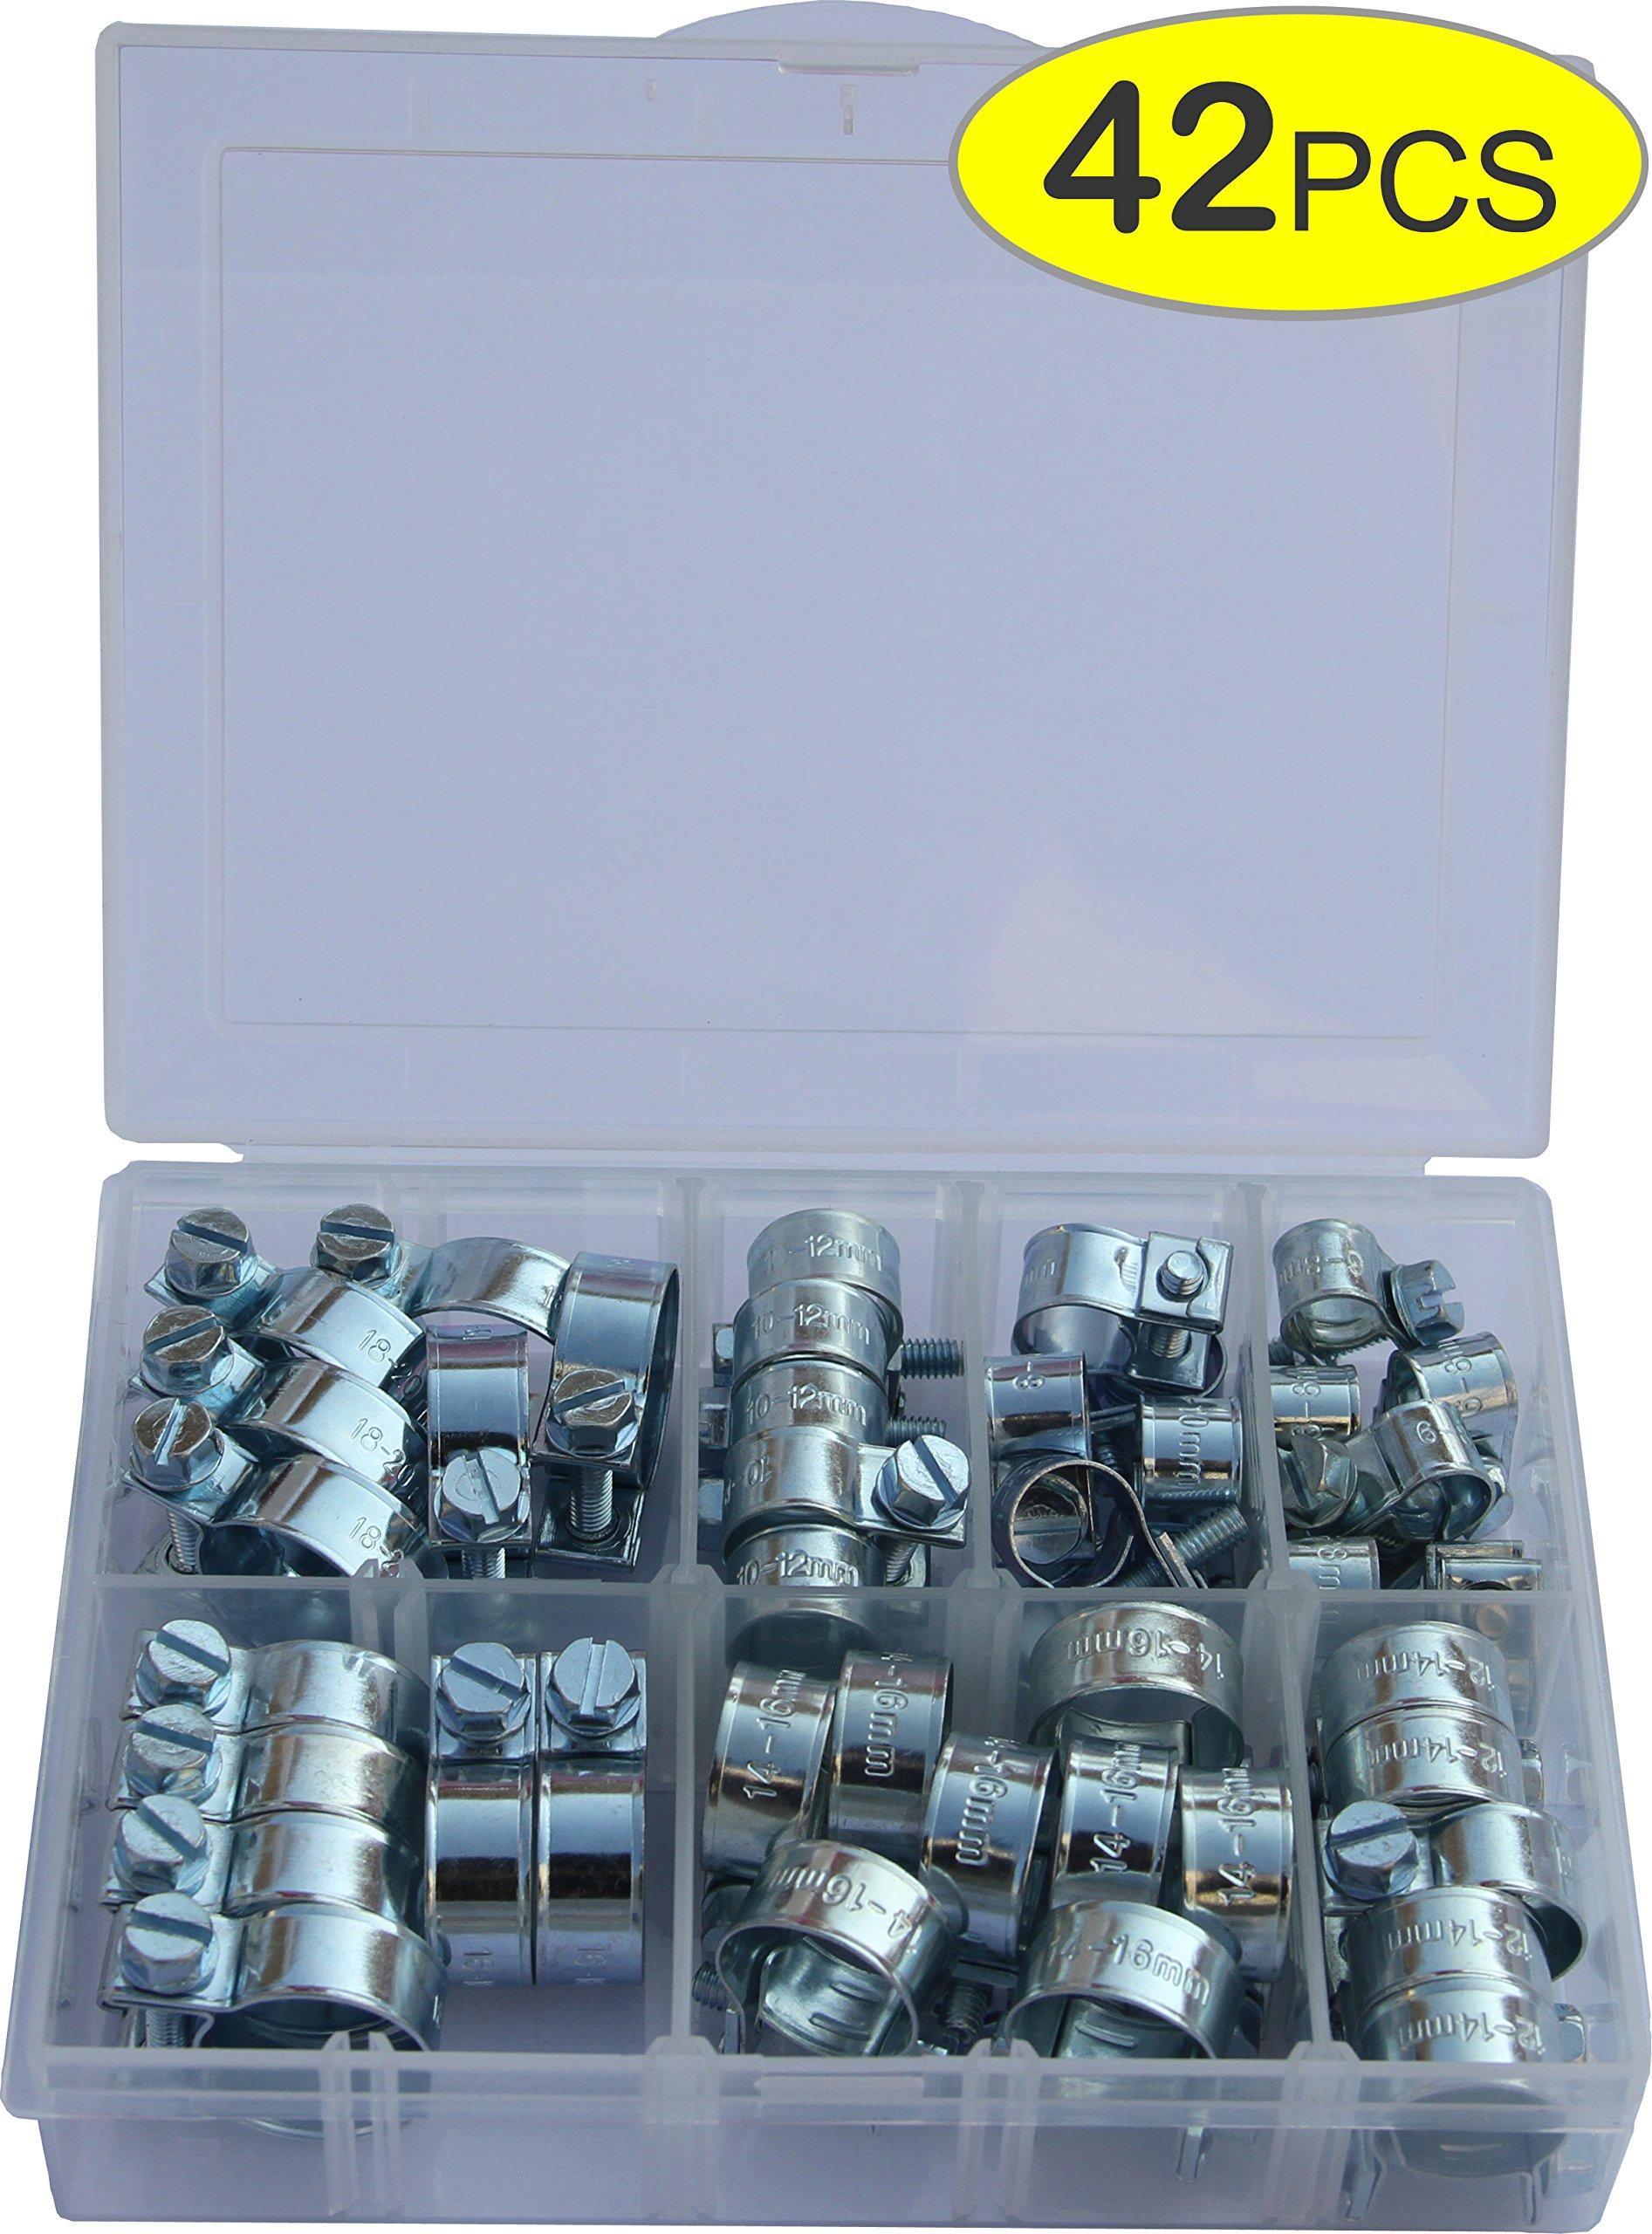 IEUYO Mini Hose Clamp,7 Sizes, 42PCS Mini Hose Clamp Assortment Kit For Pipe/Tube/ Cable/Line, Fuel Tube,Air Tube,Zinc Plated Steel , Adjustable, Range 6- 20mm